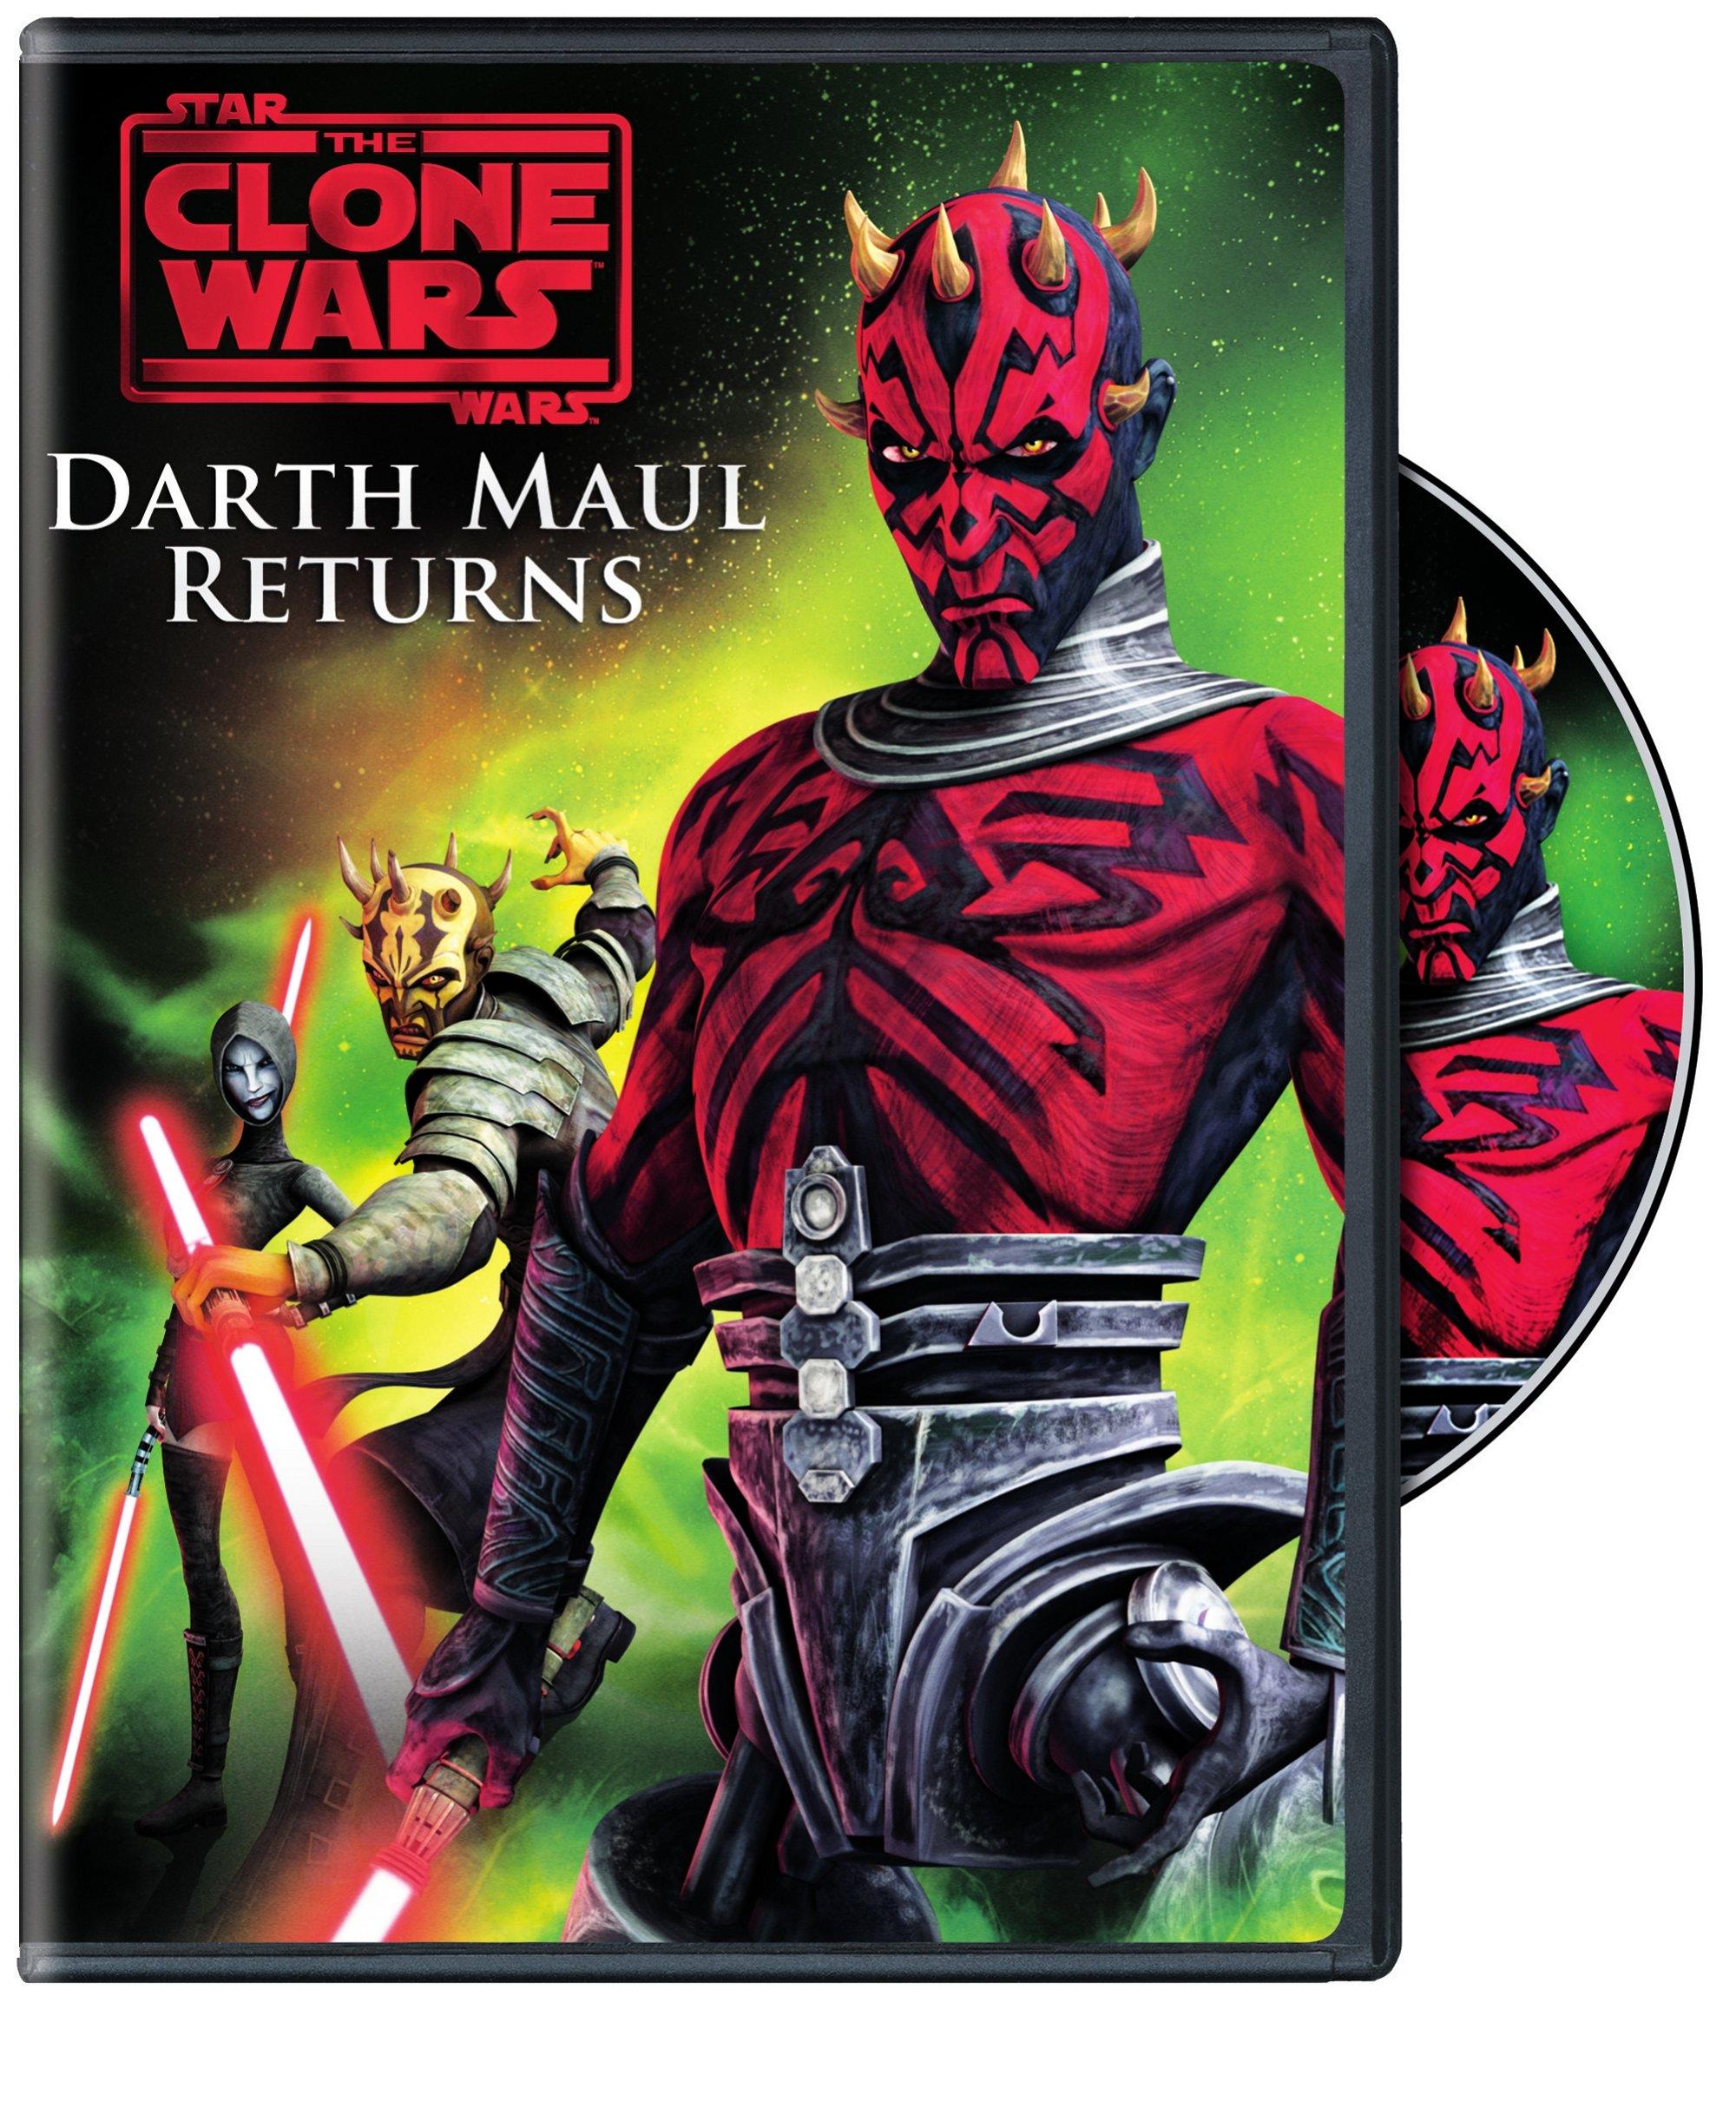 Star Wars The Clone Wars: Darth Maul Returns DVD